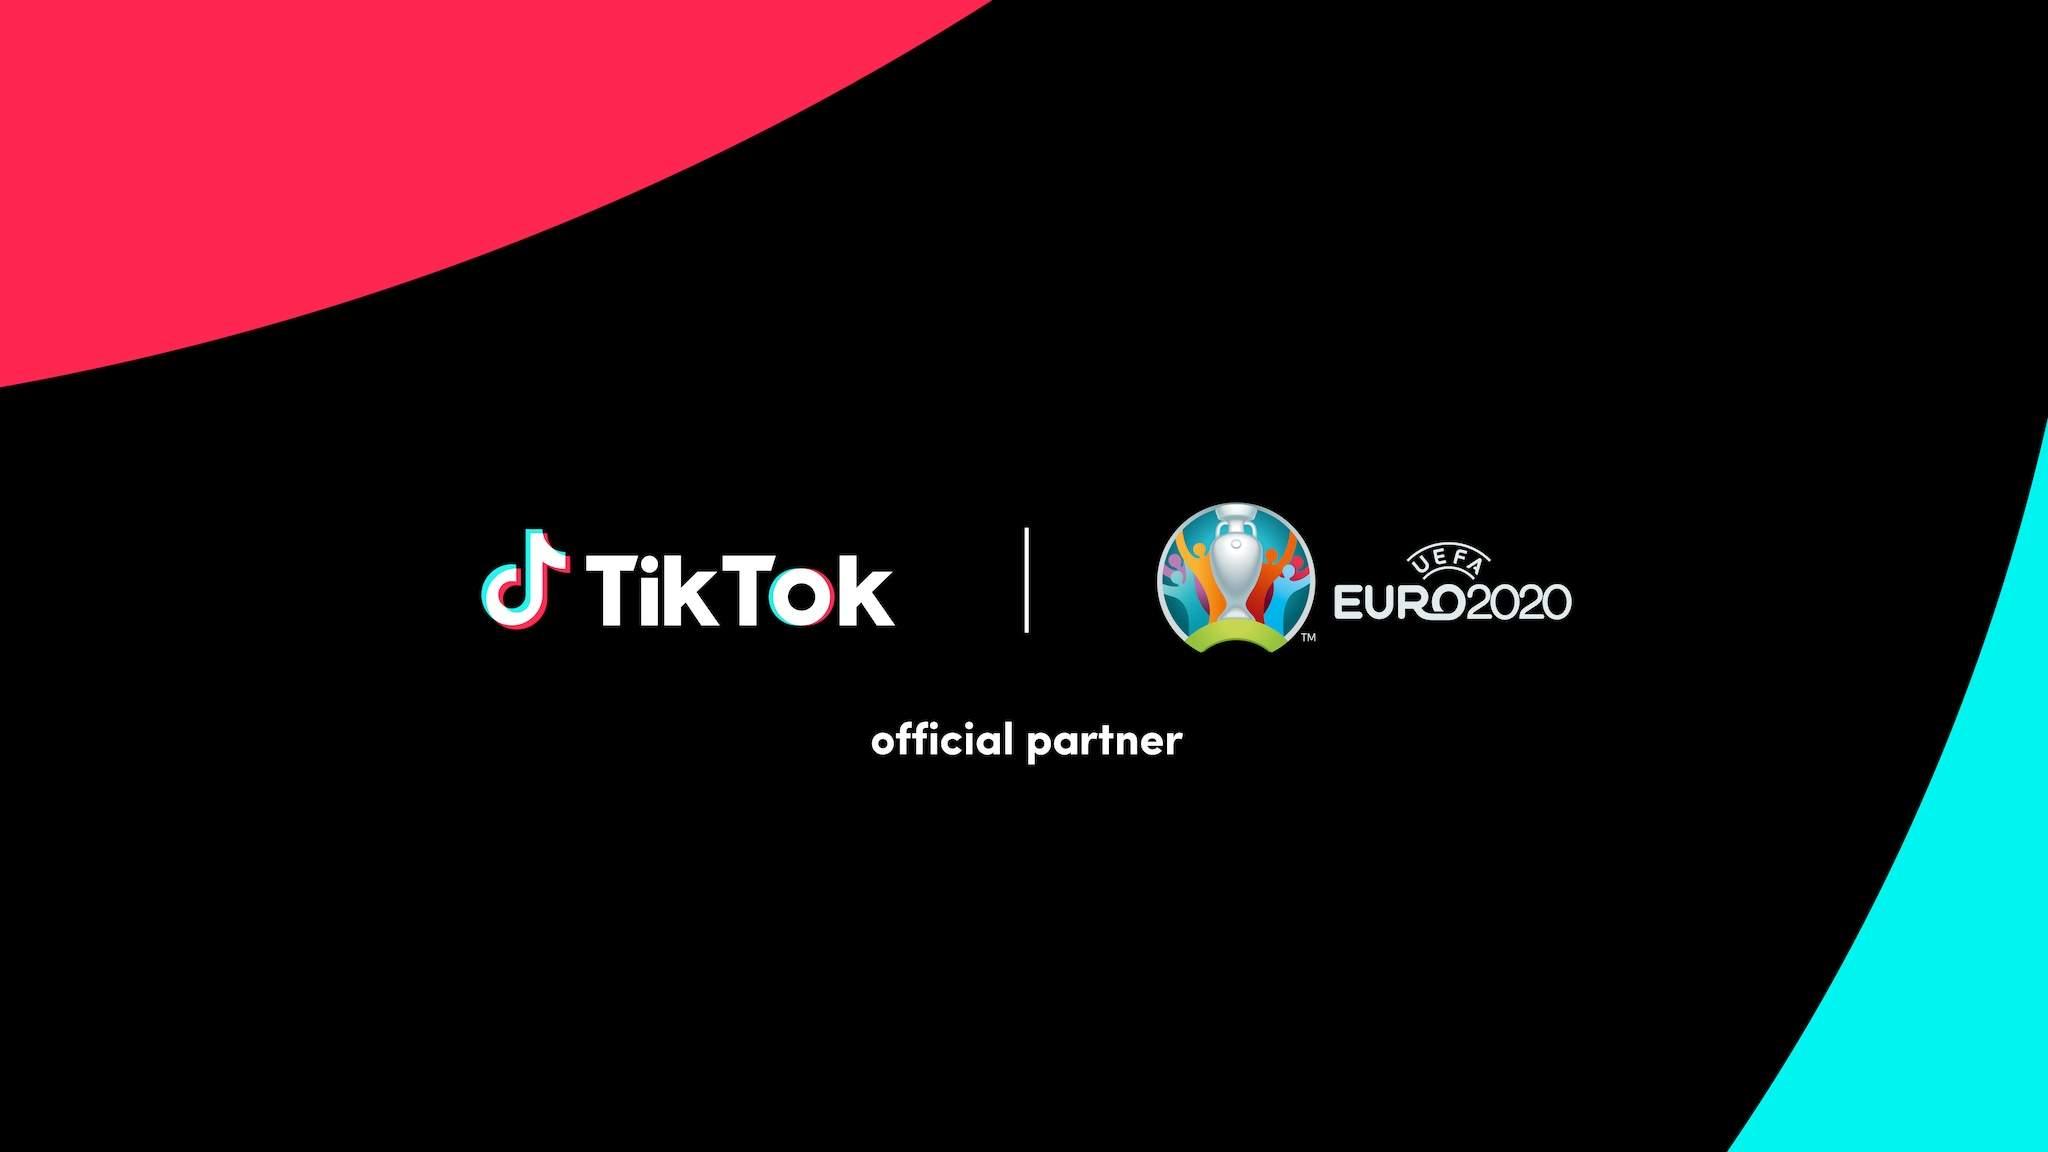 TikTok se convierte en patrocinador mundial de la Eurocopa 2020